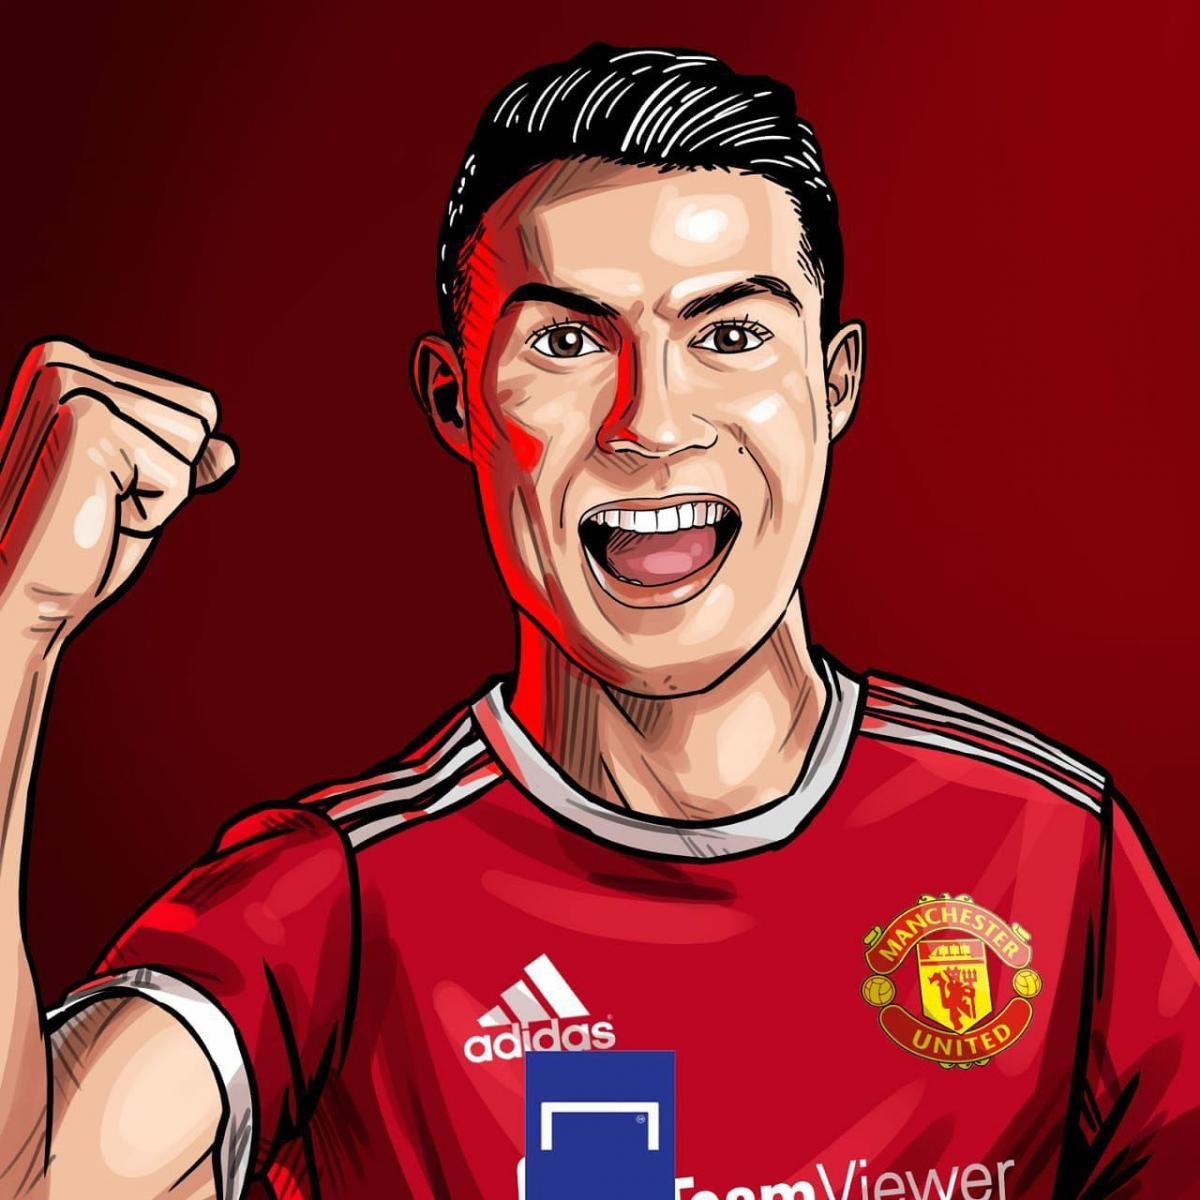 Cristiano Ronaldo ghi liền 4 bàn trong 3 trận cho MU. (Ảnh: Goal)